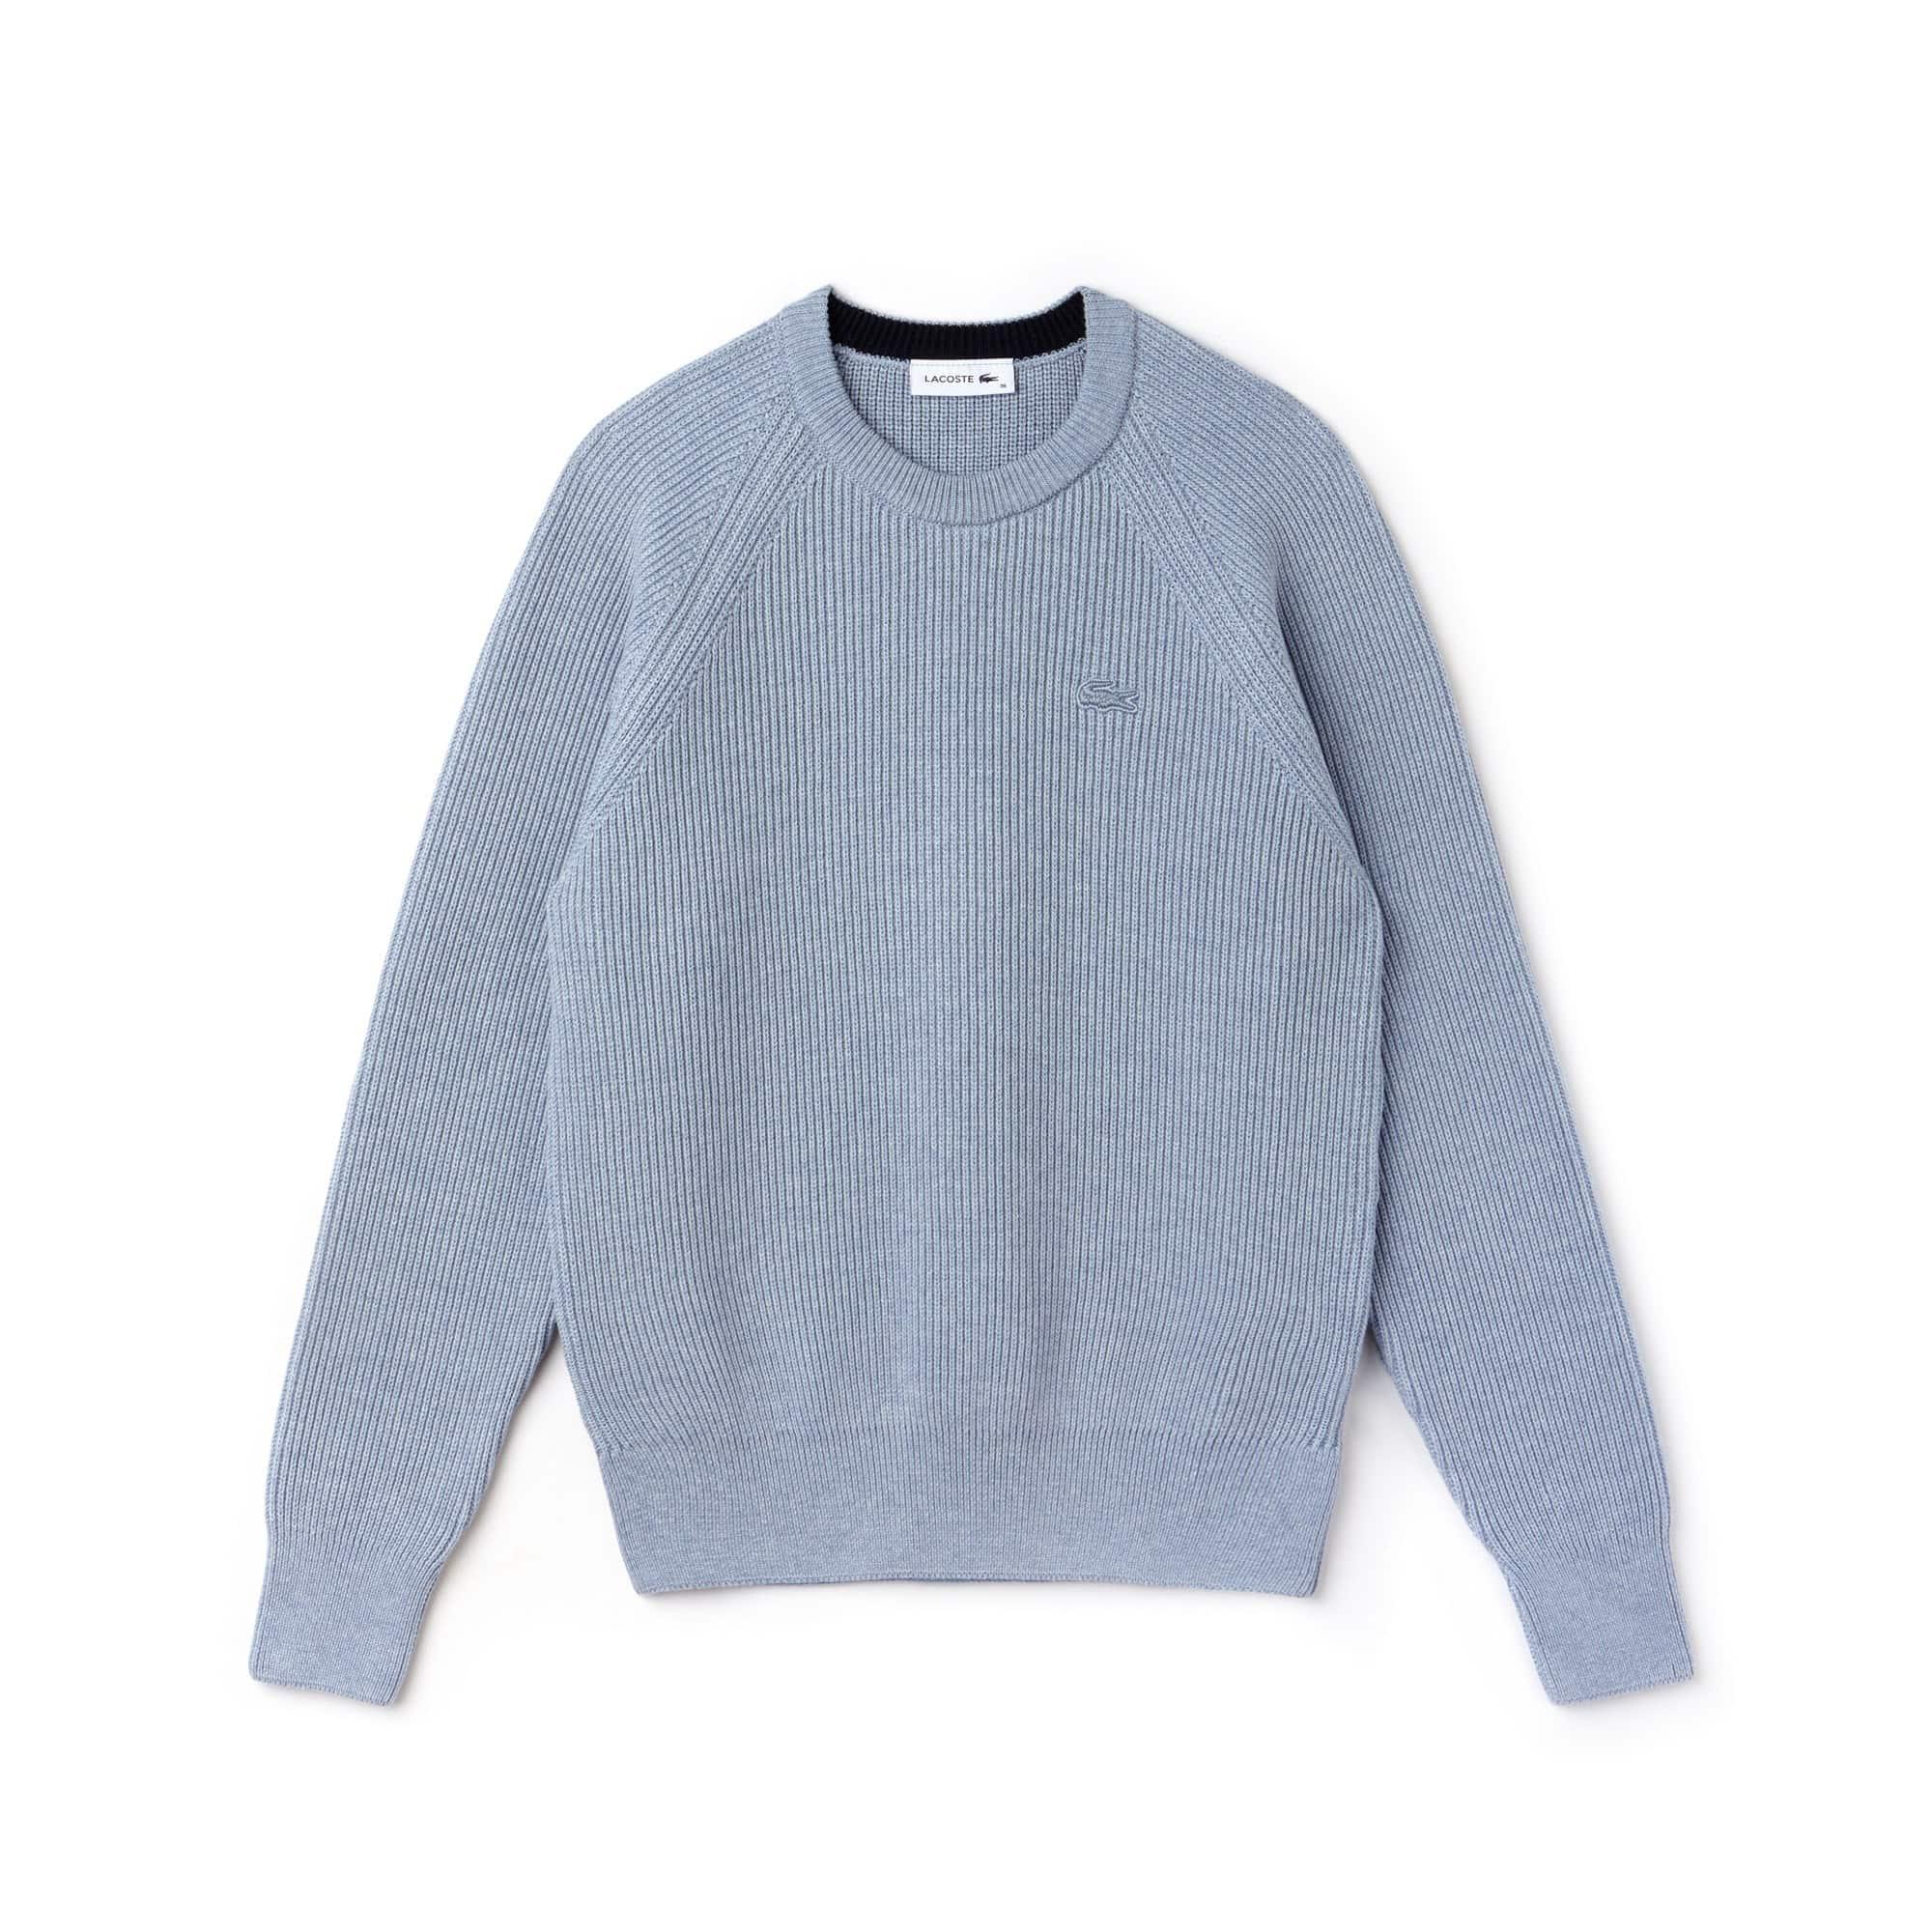 Pullover a girocollo in cotone e lana a costine tinta unita